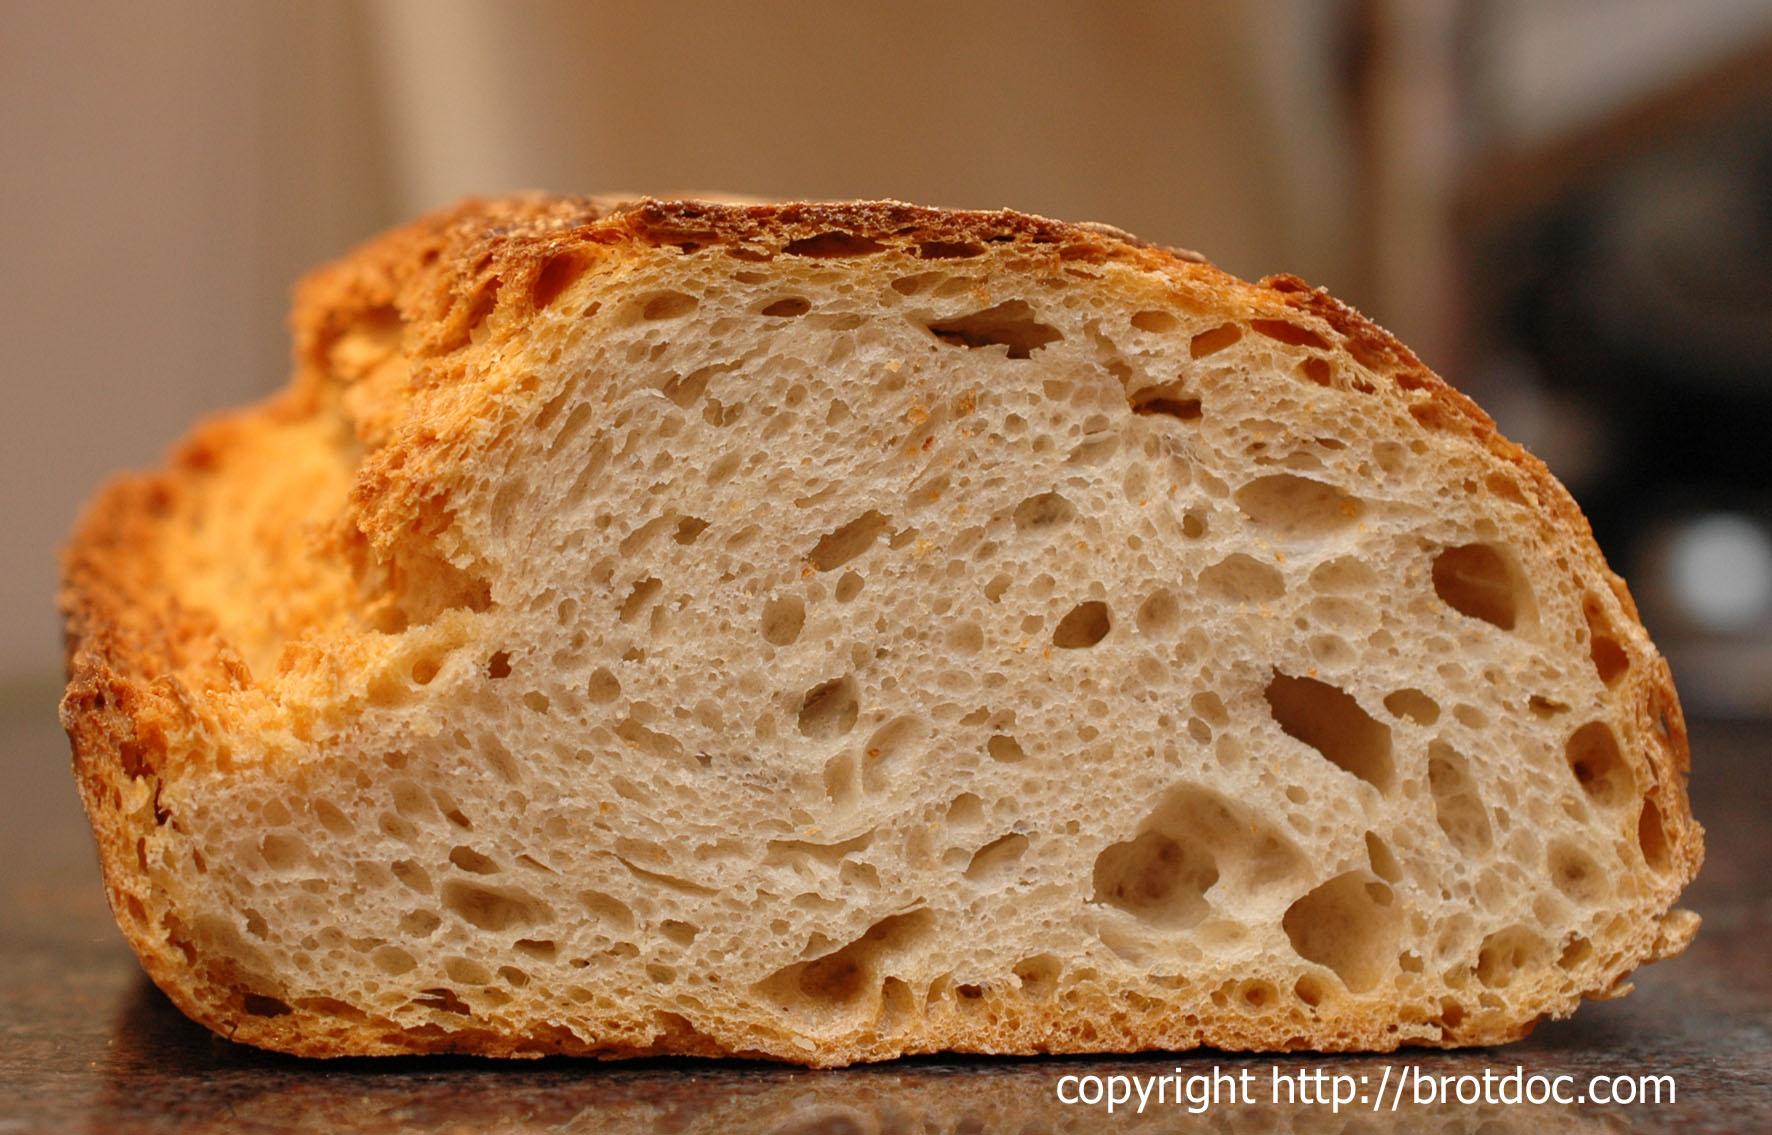 Dinkel Sauerteigbrot Spelt Sourdough Der Brotdoc